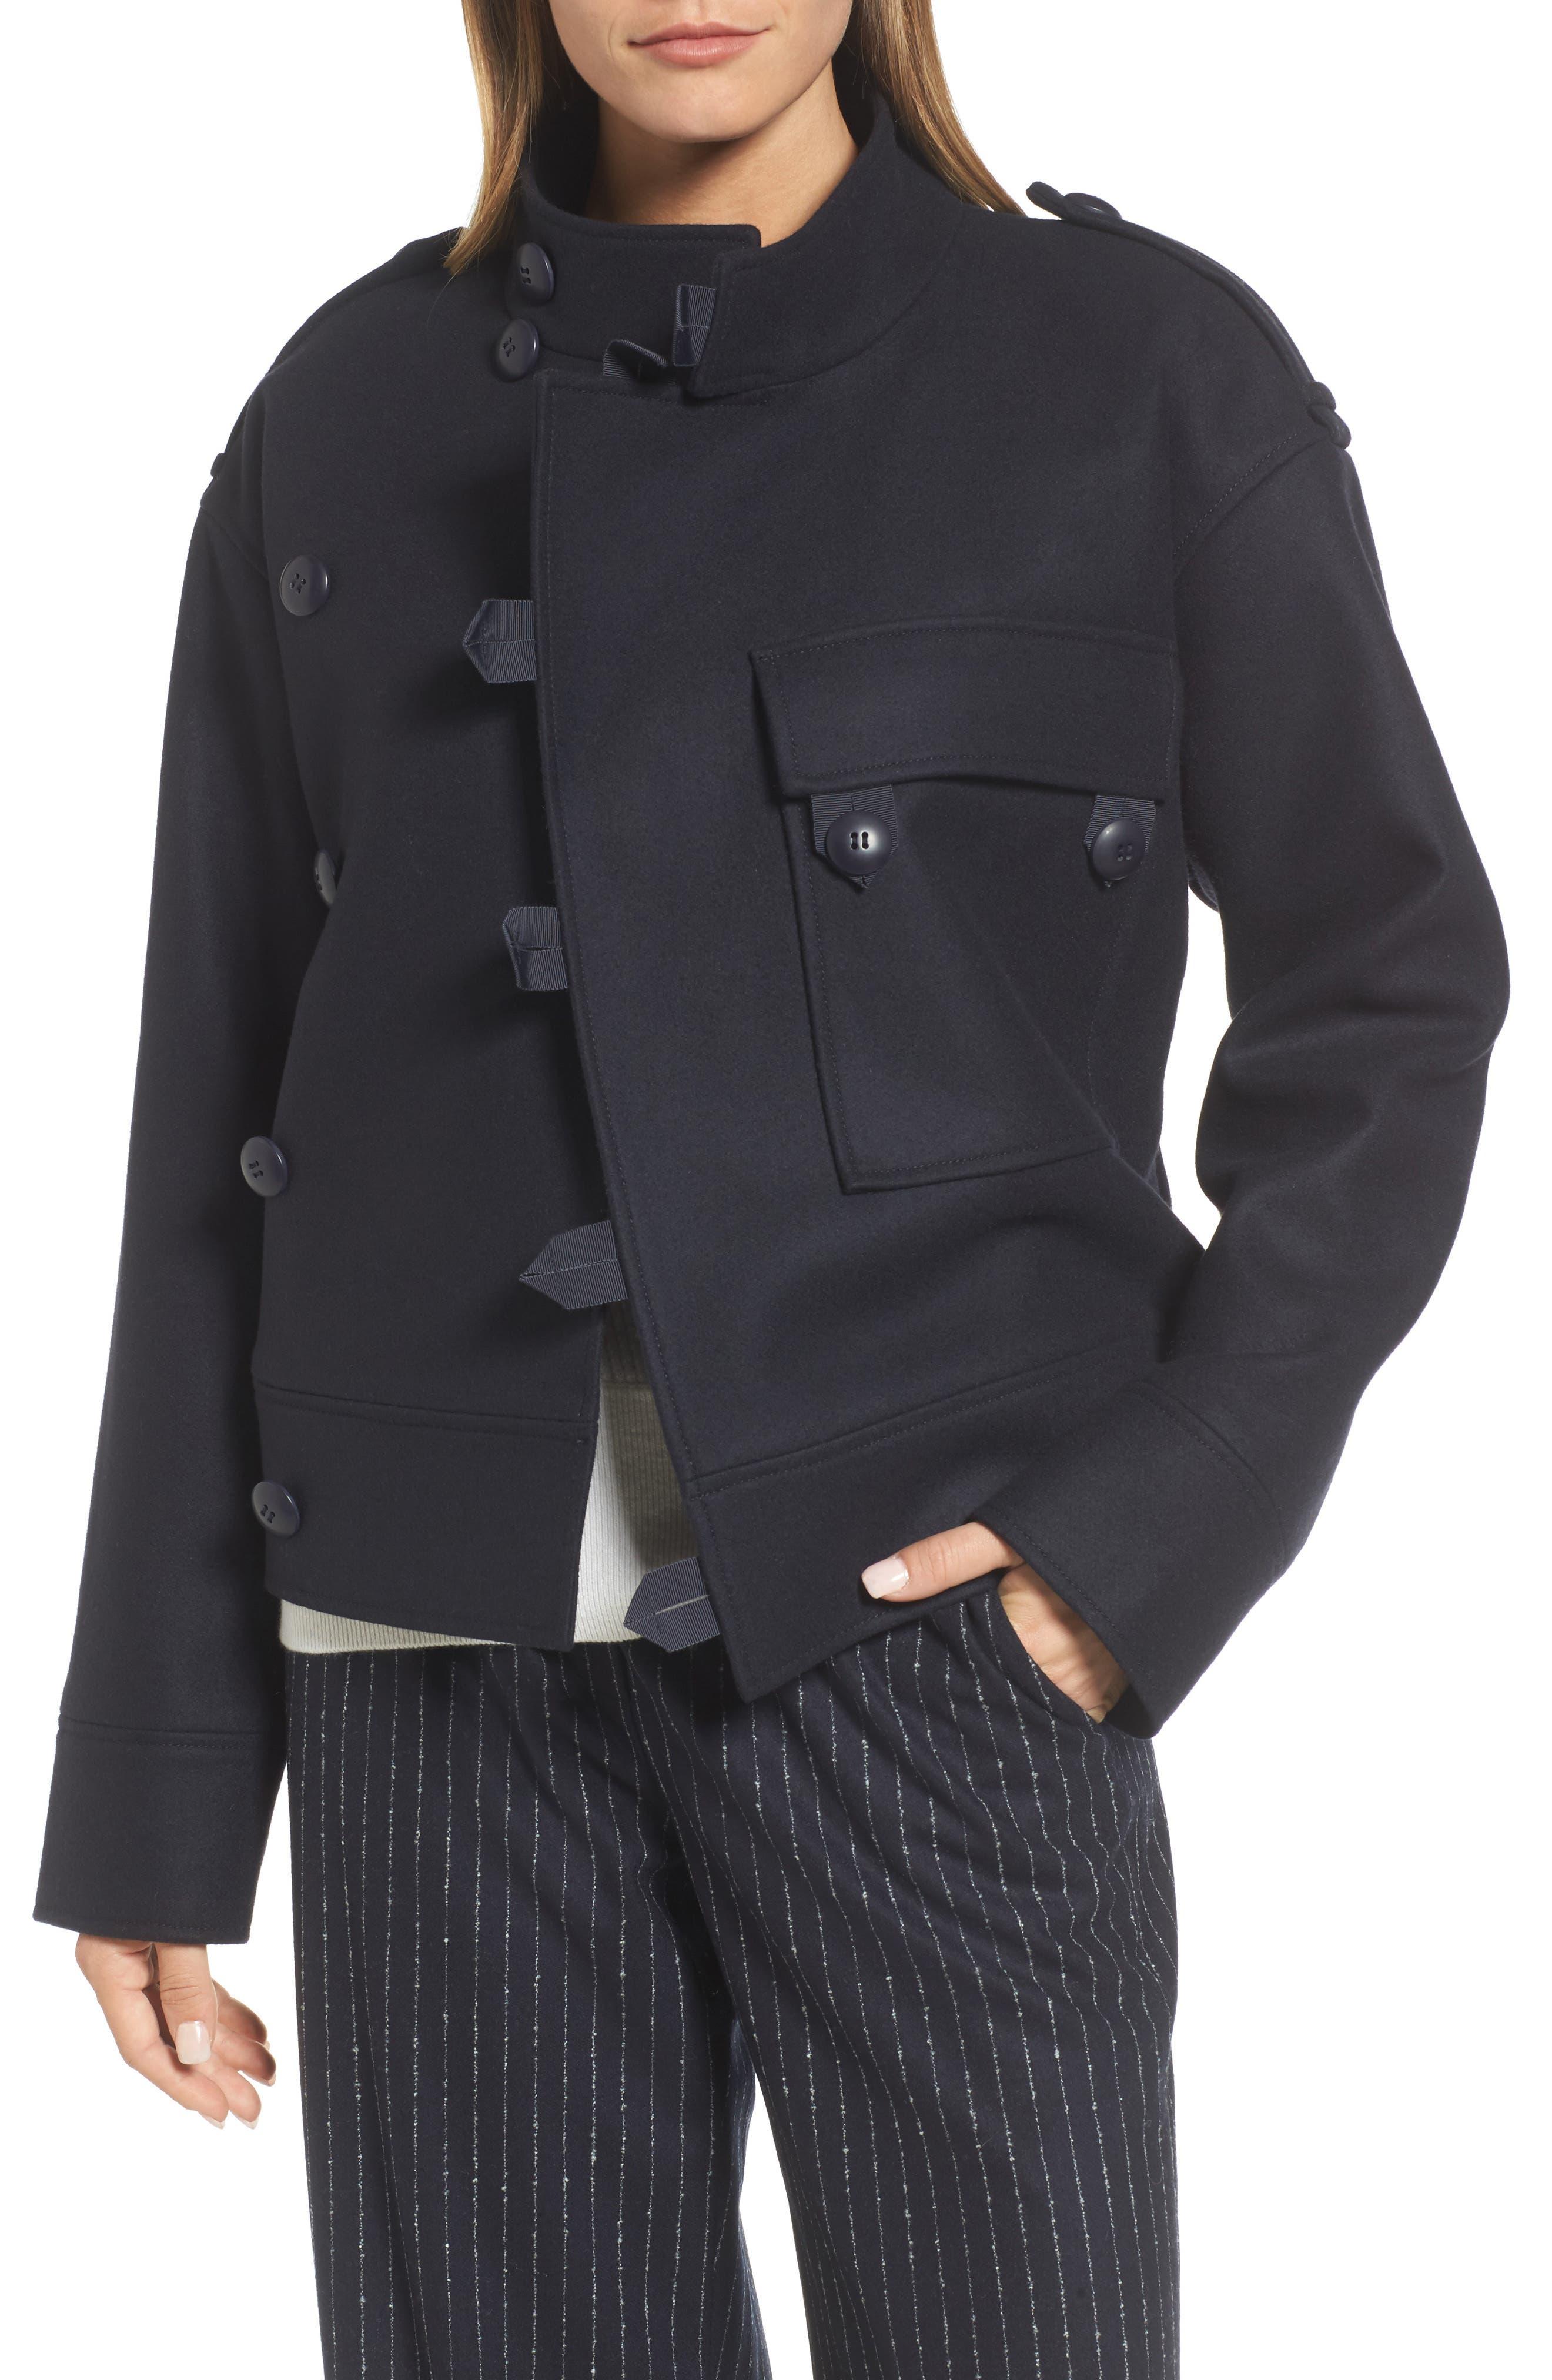 Alternate Image 1 Selected - Nordstrom Signature Wool Sculpted Jacket